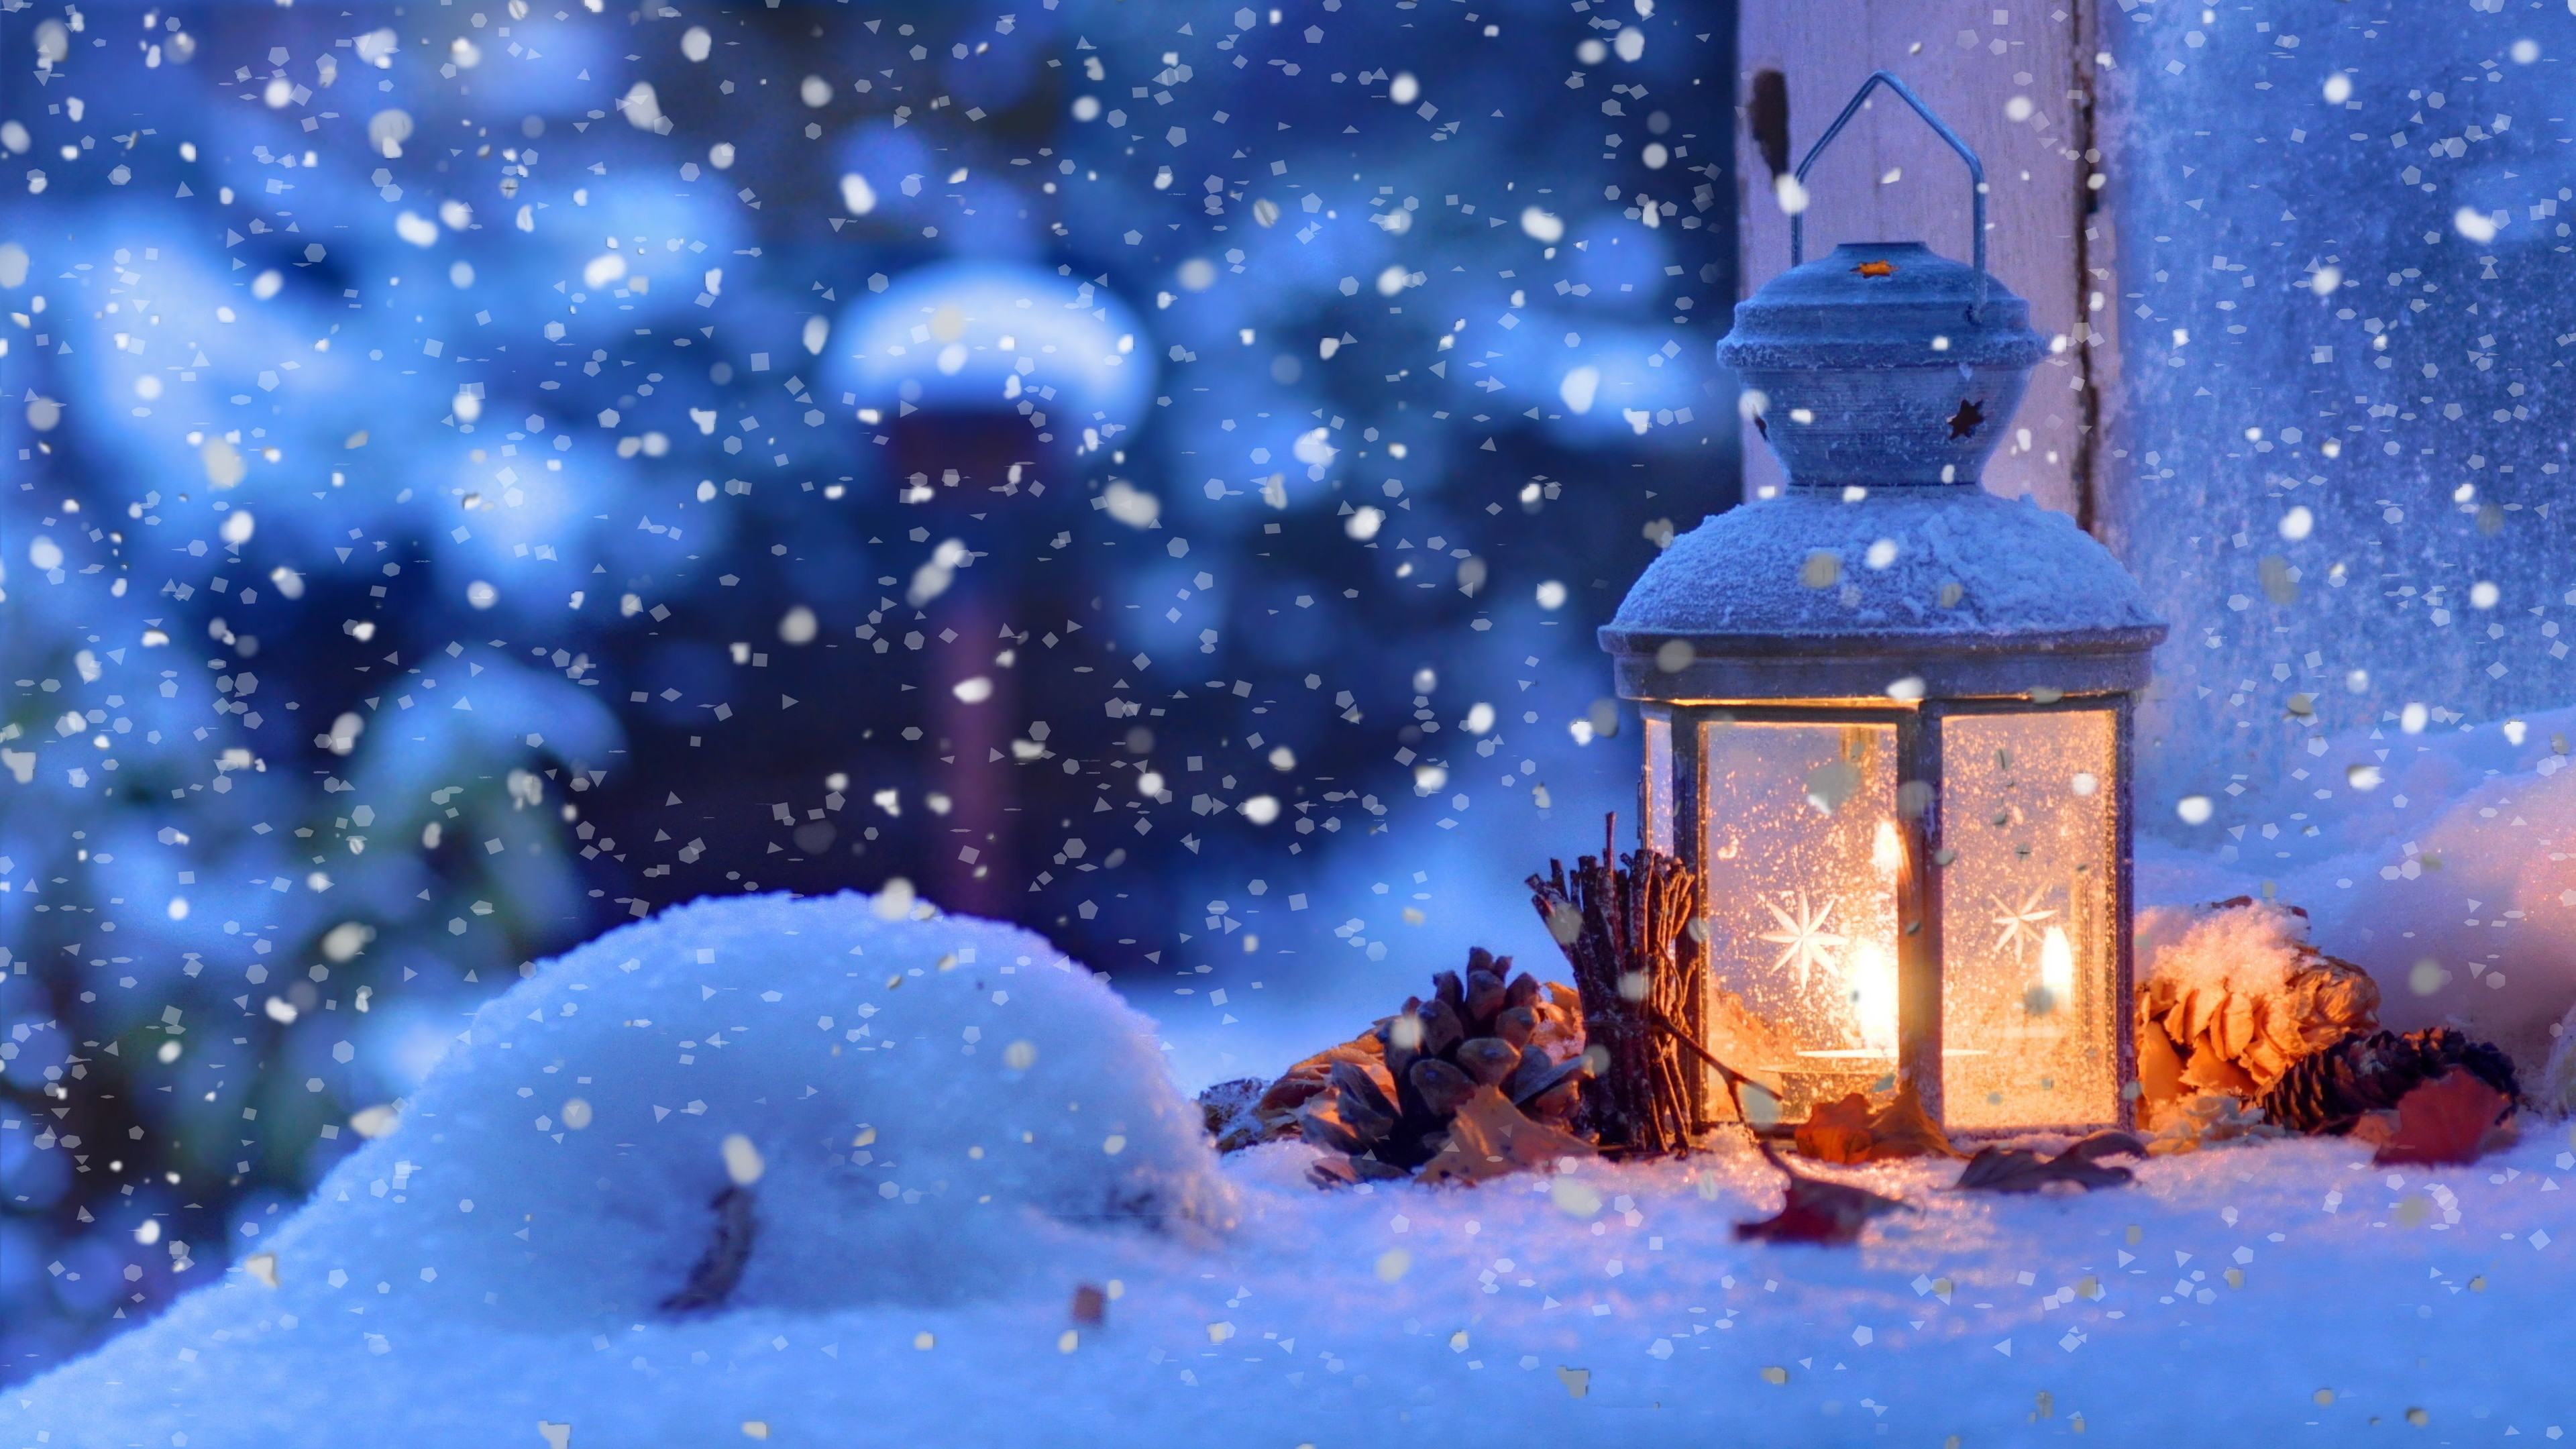 Christmas Snow Wallpapers 1080p